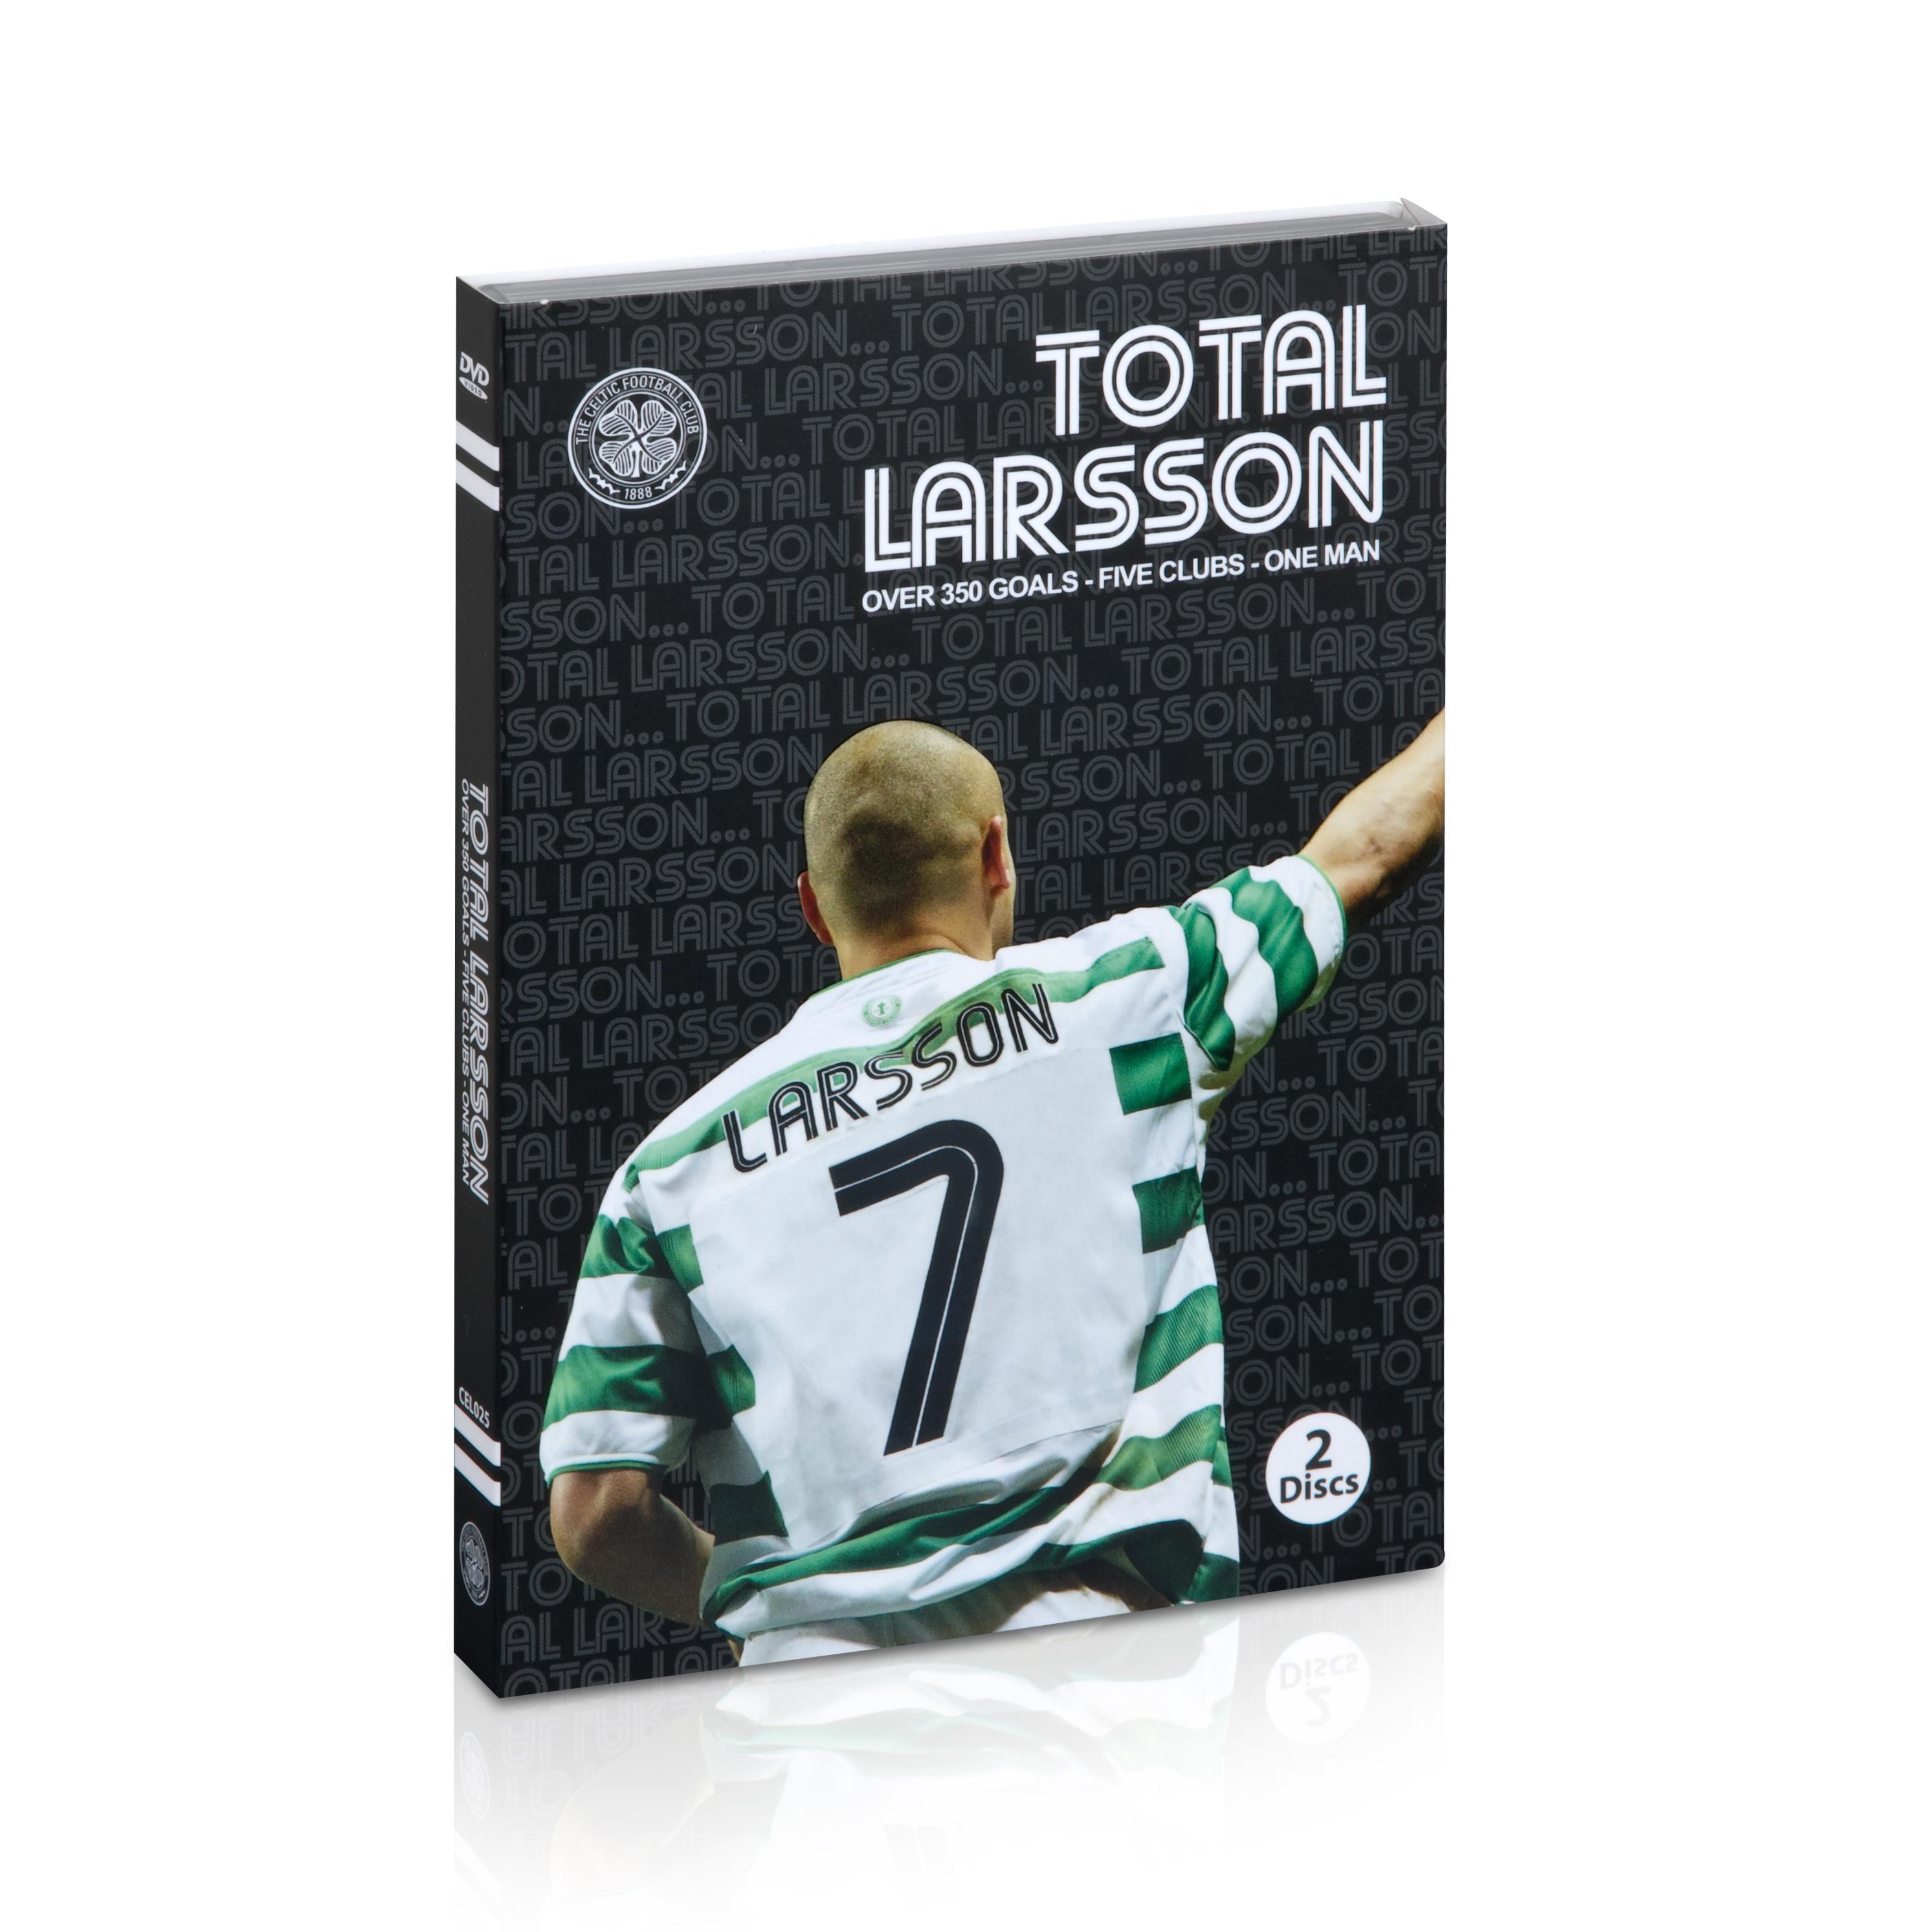 Celtic Total Larsson - The Definitive Henrik Larsson Collection - Two Disc DVD